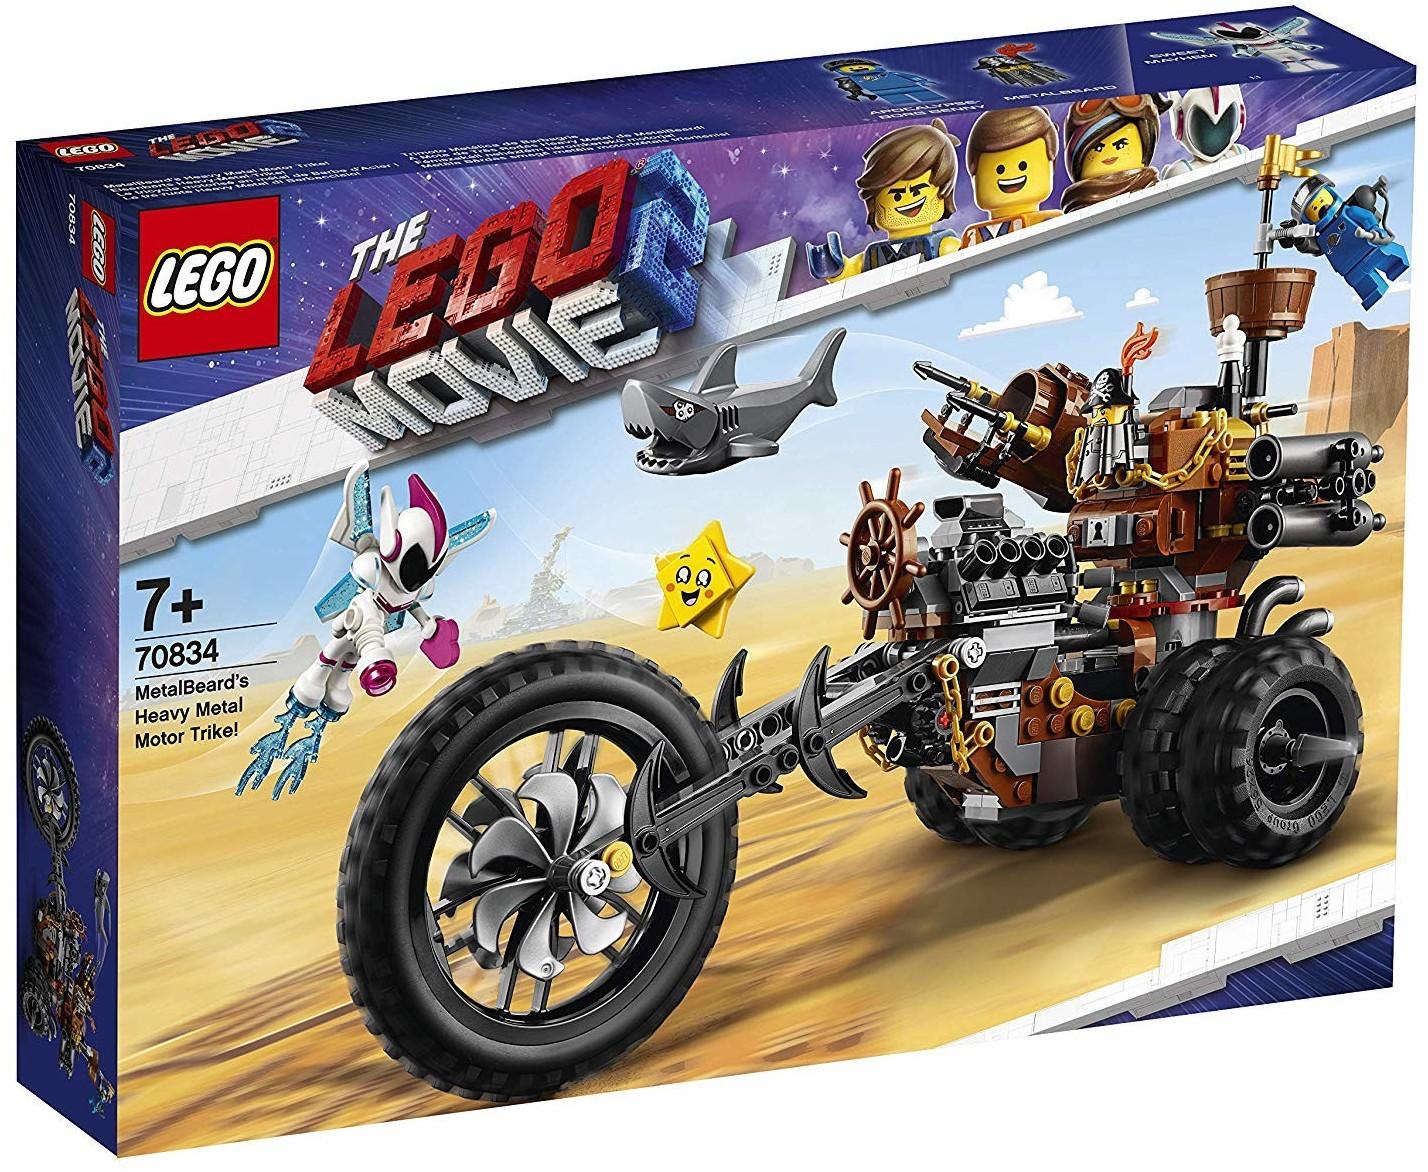 LEGO The Movie 2 - EisenBarts Heavy-Metal-Trike! (70834)